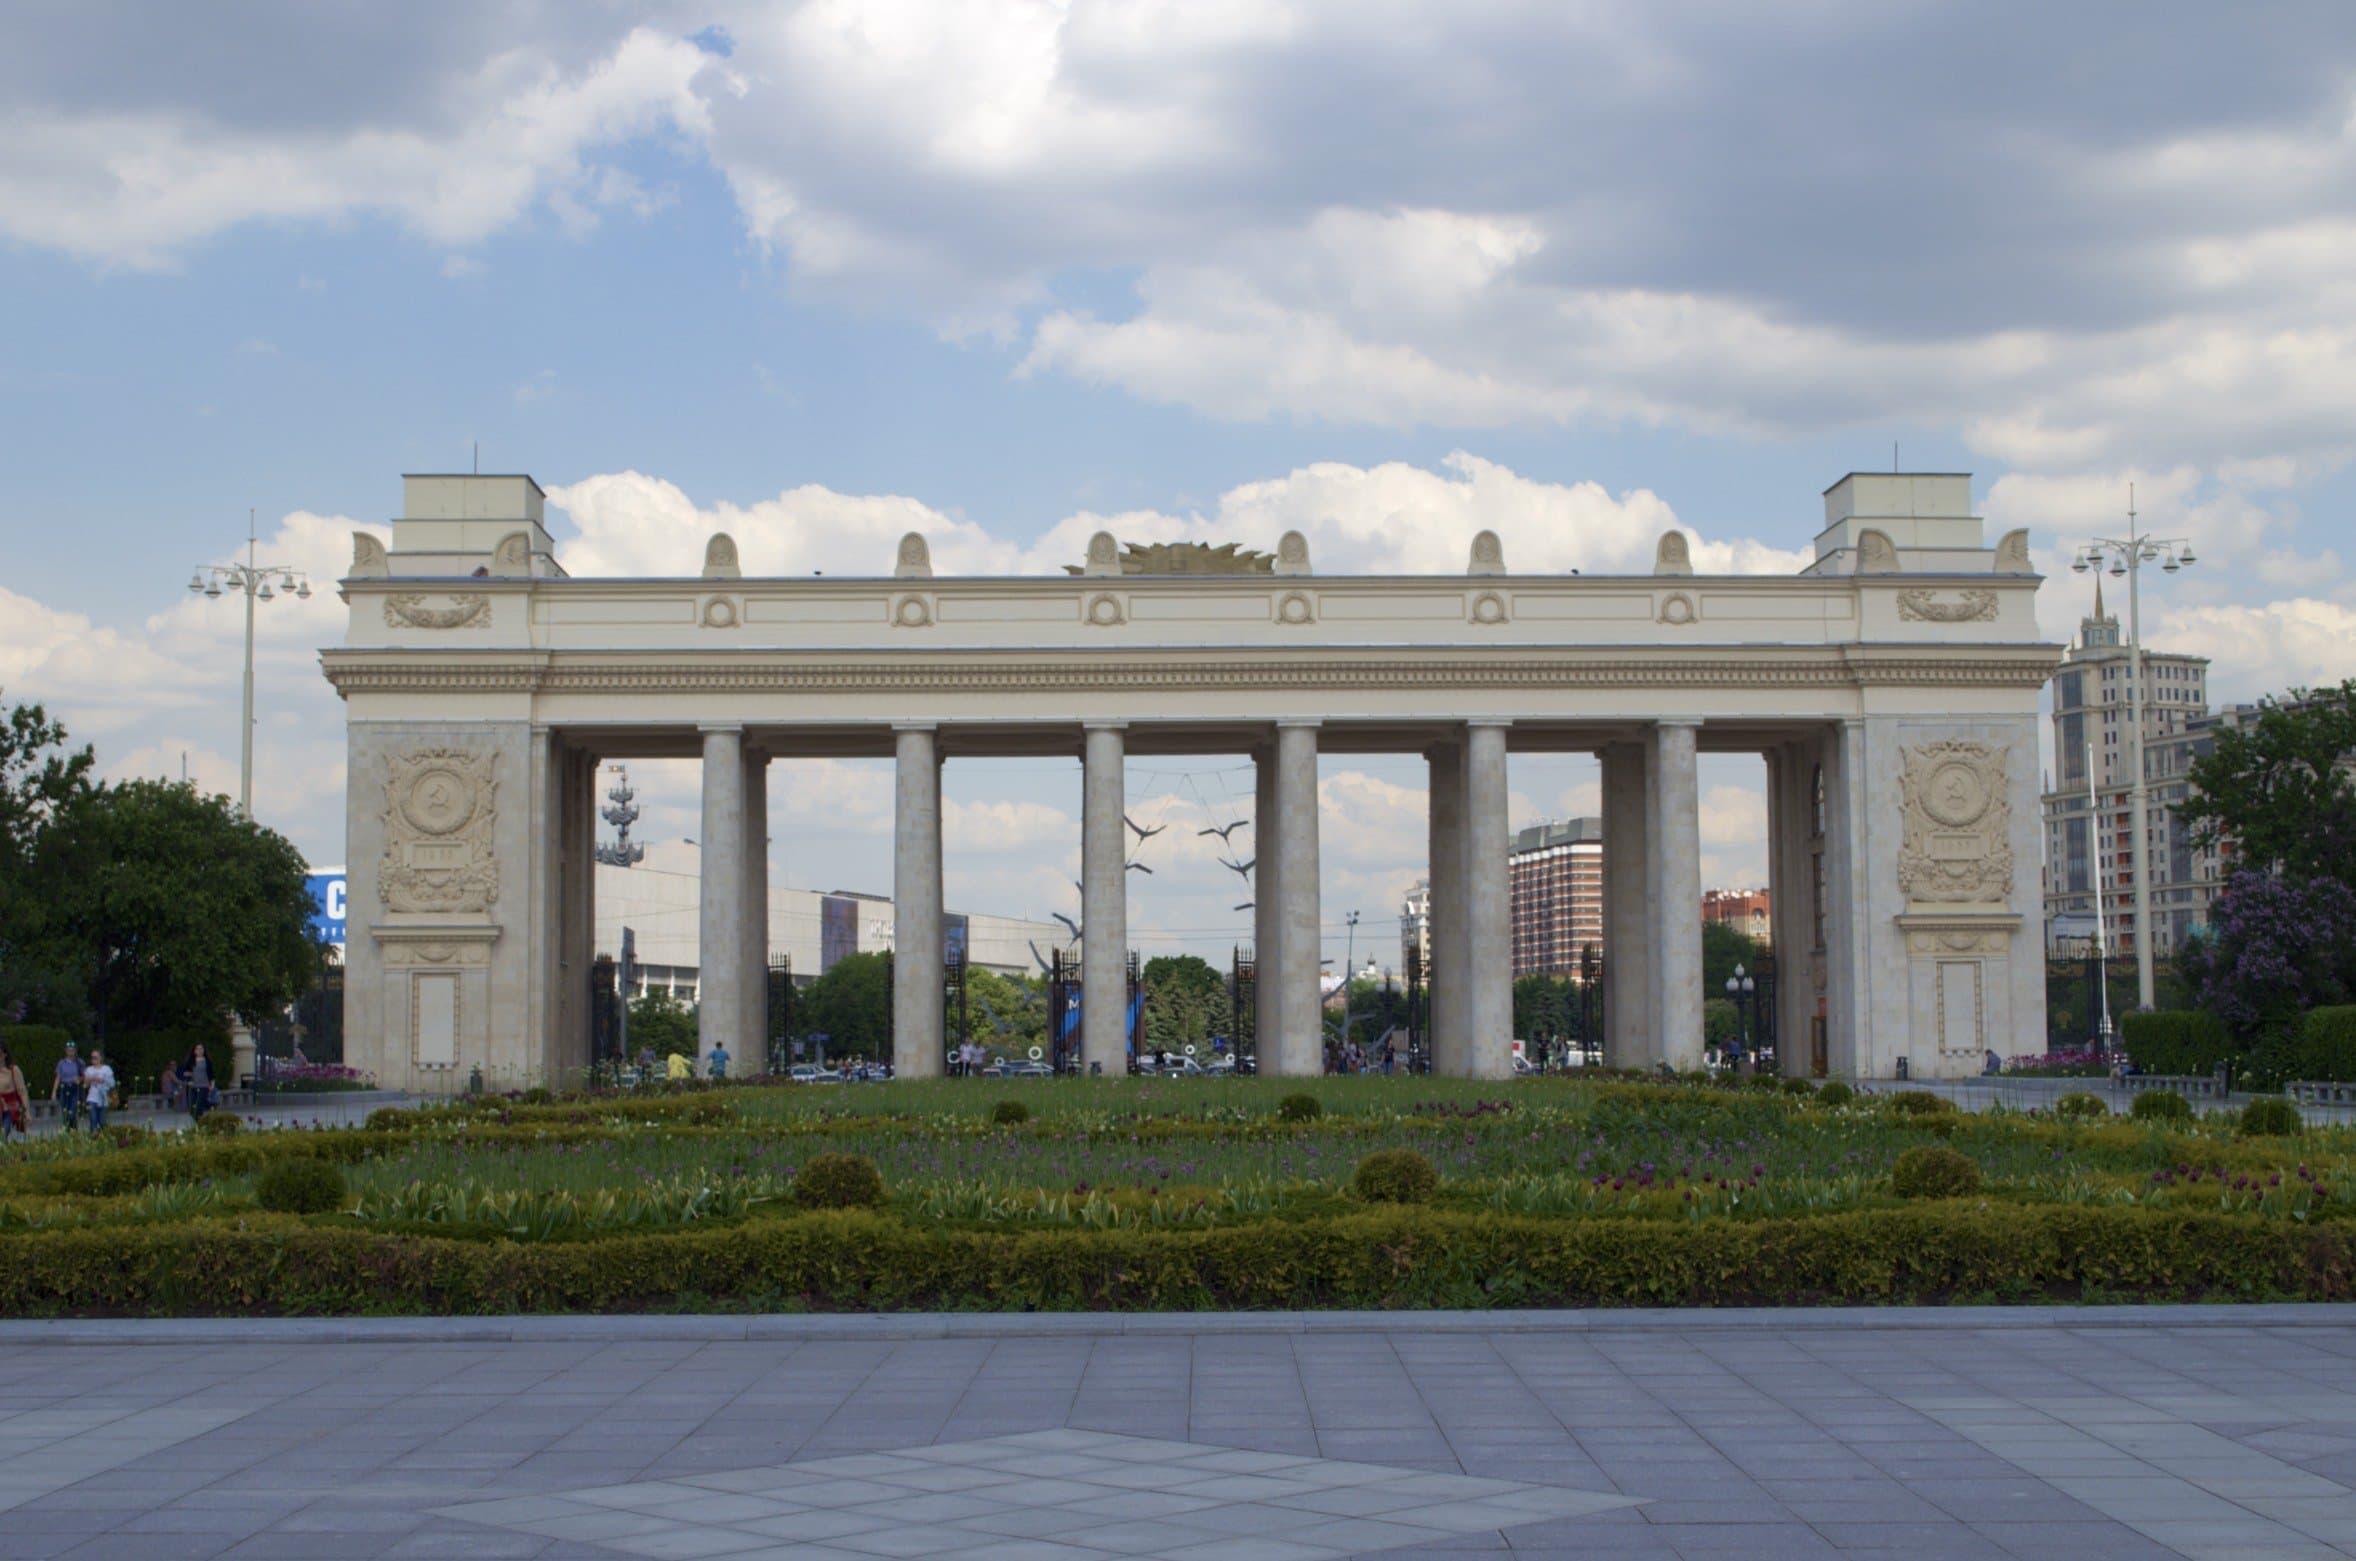 Eingang Gorki Park